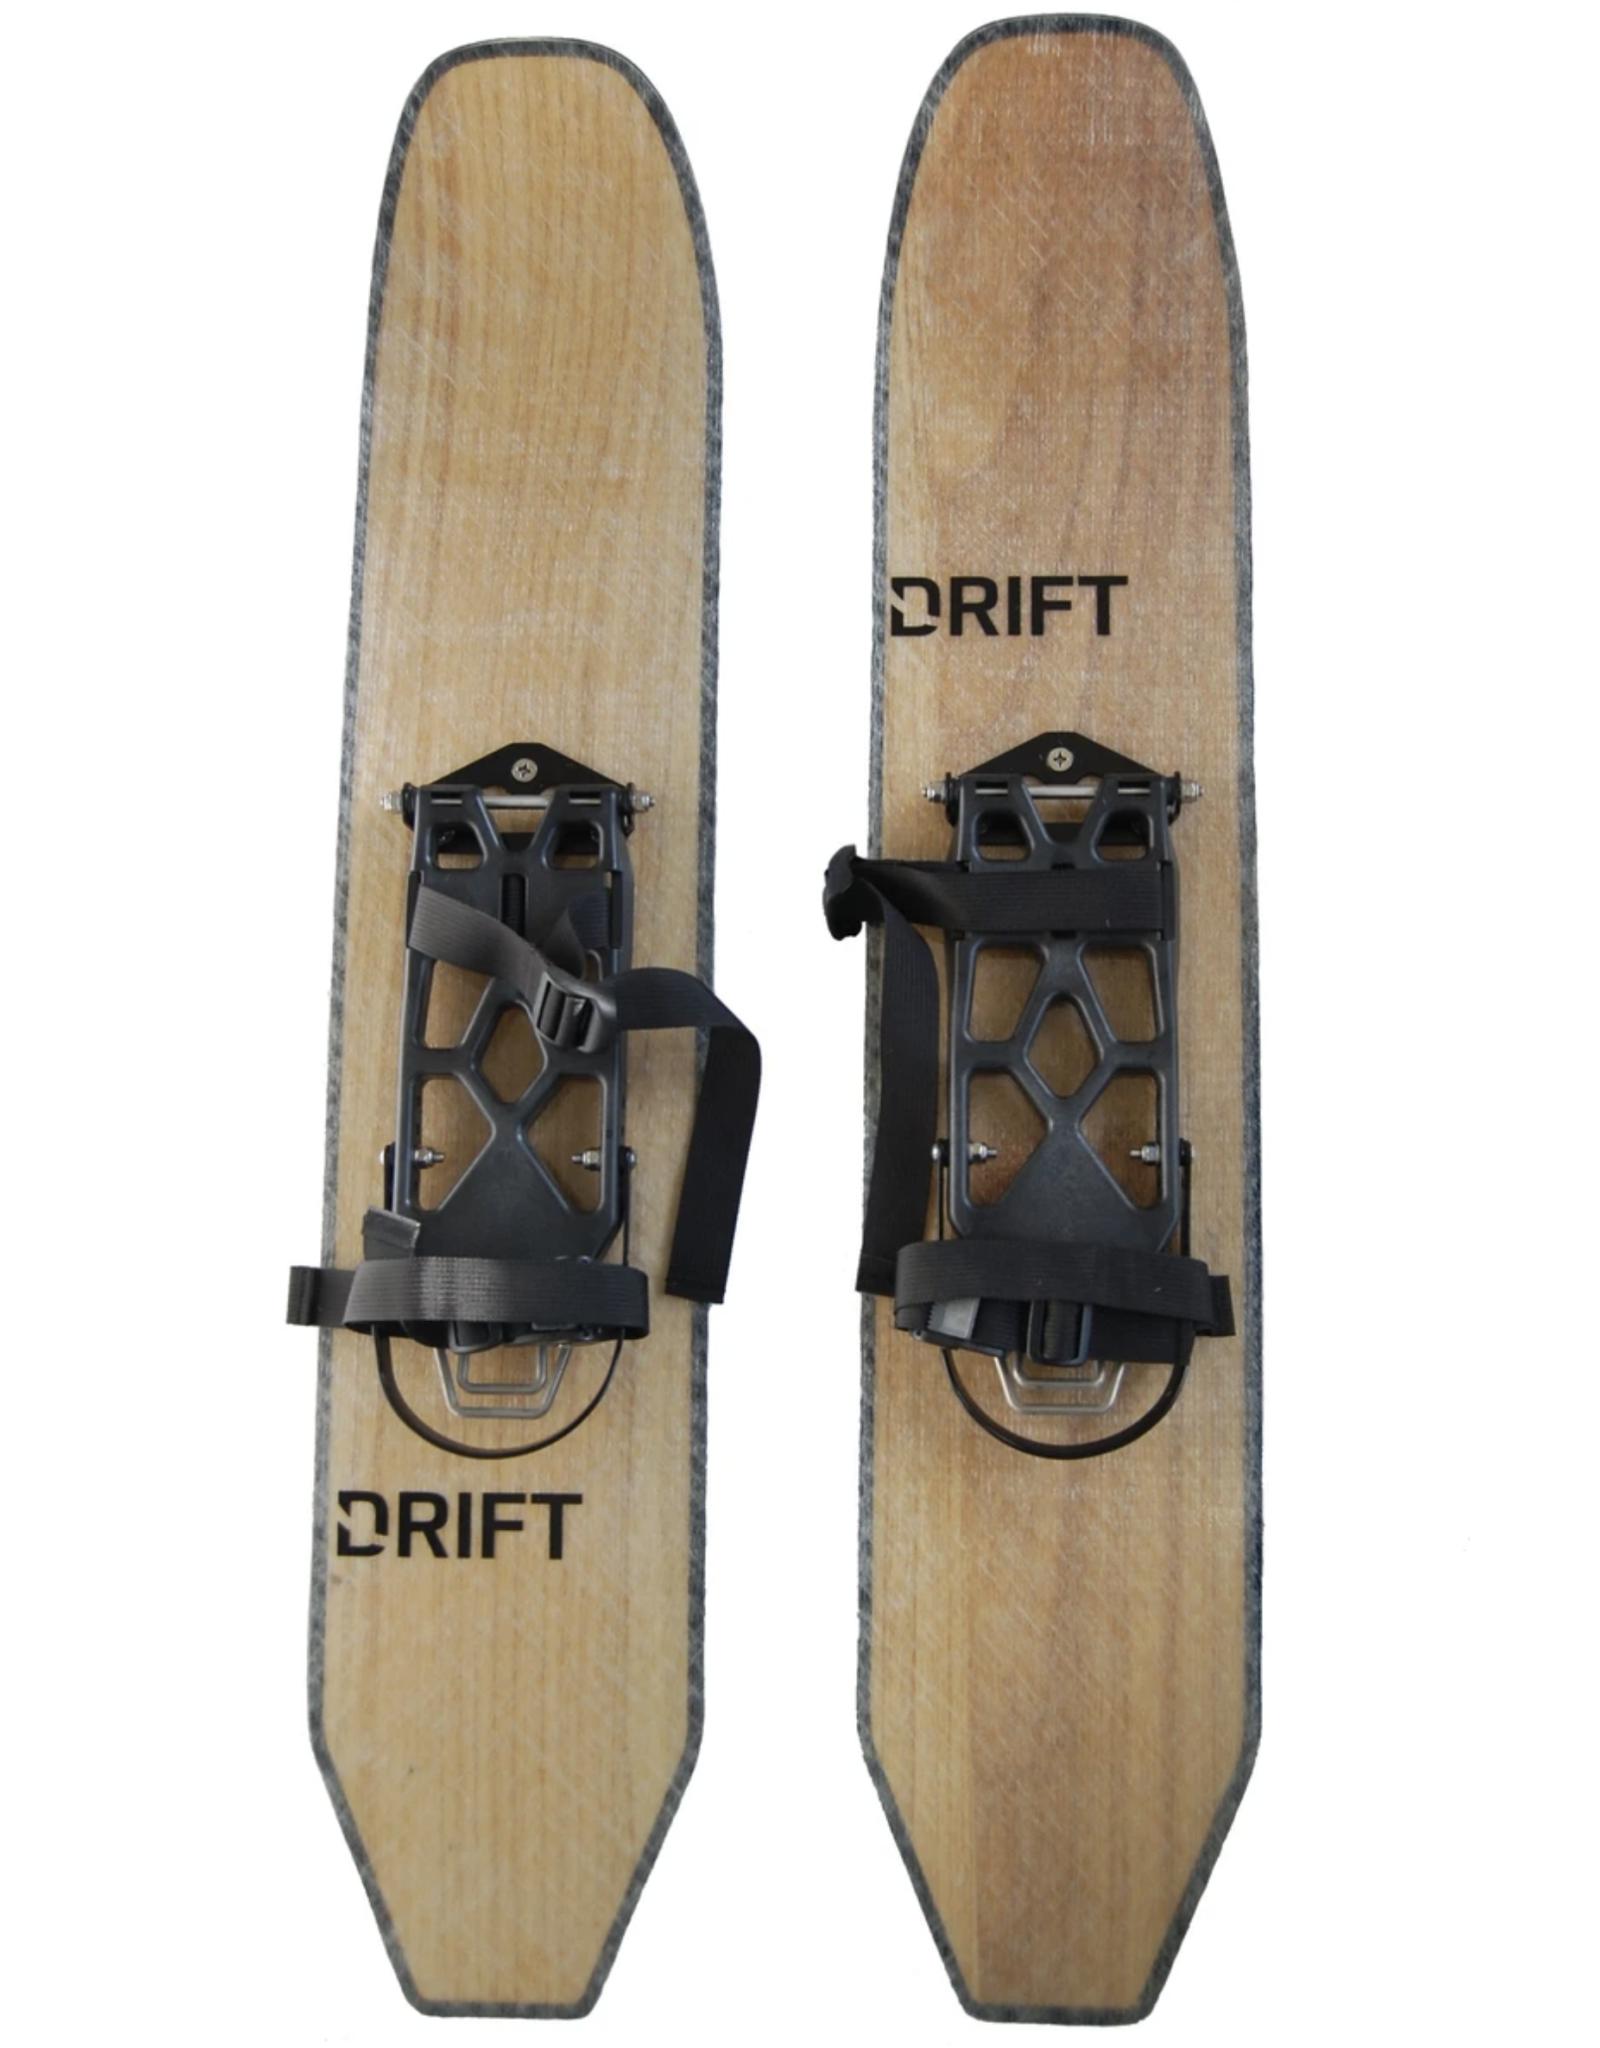 Drift Drift Board back country access